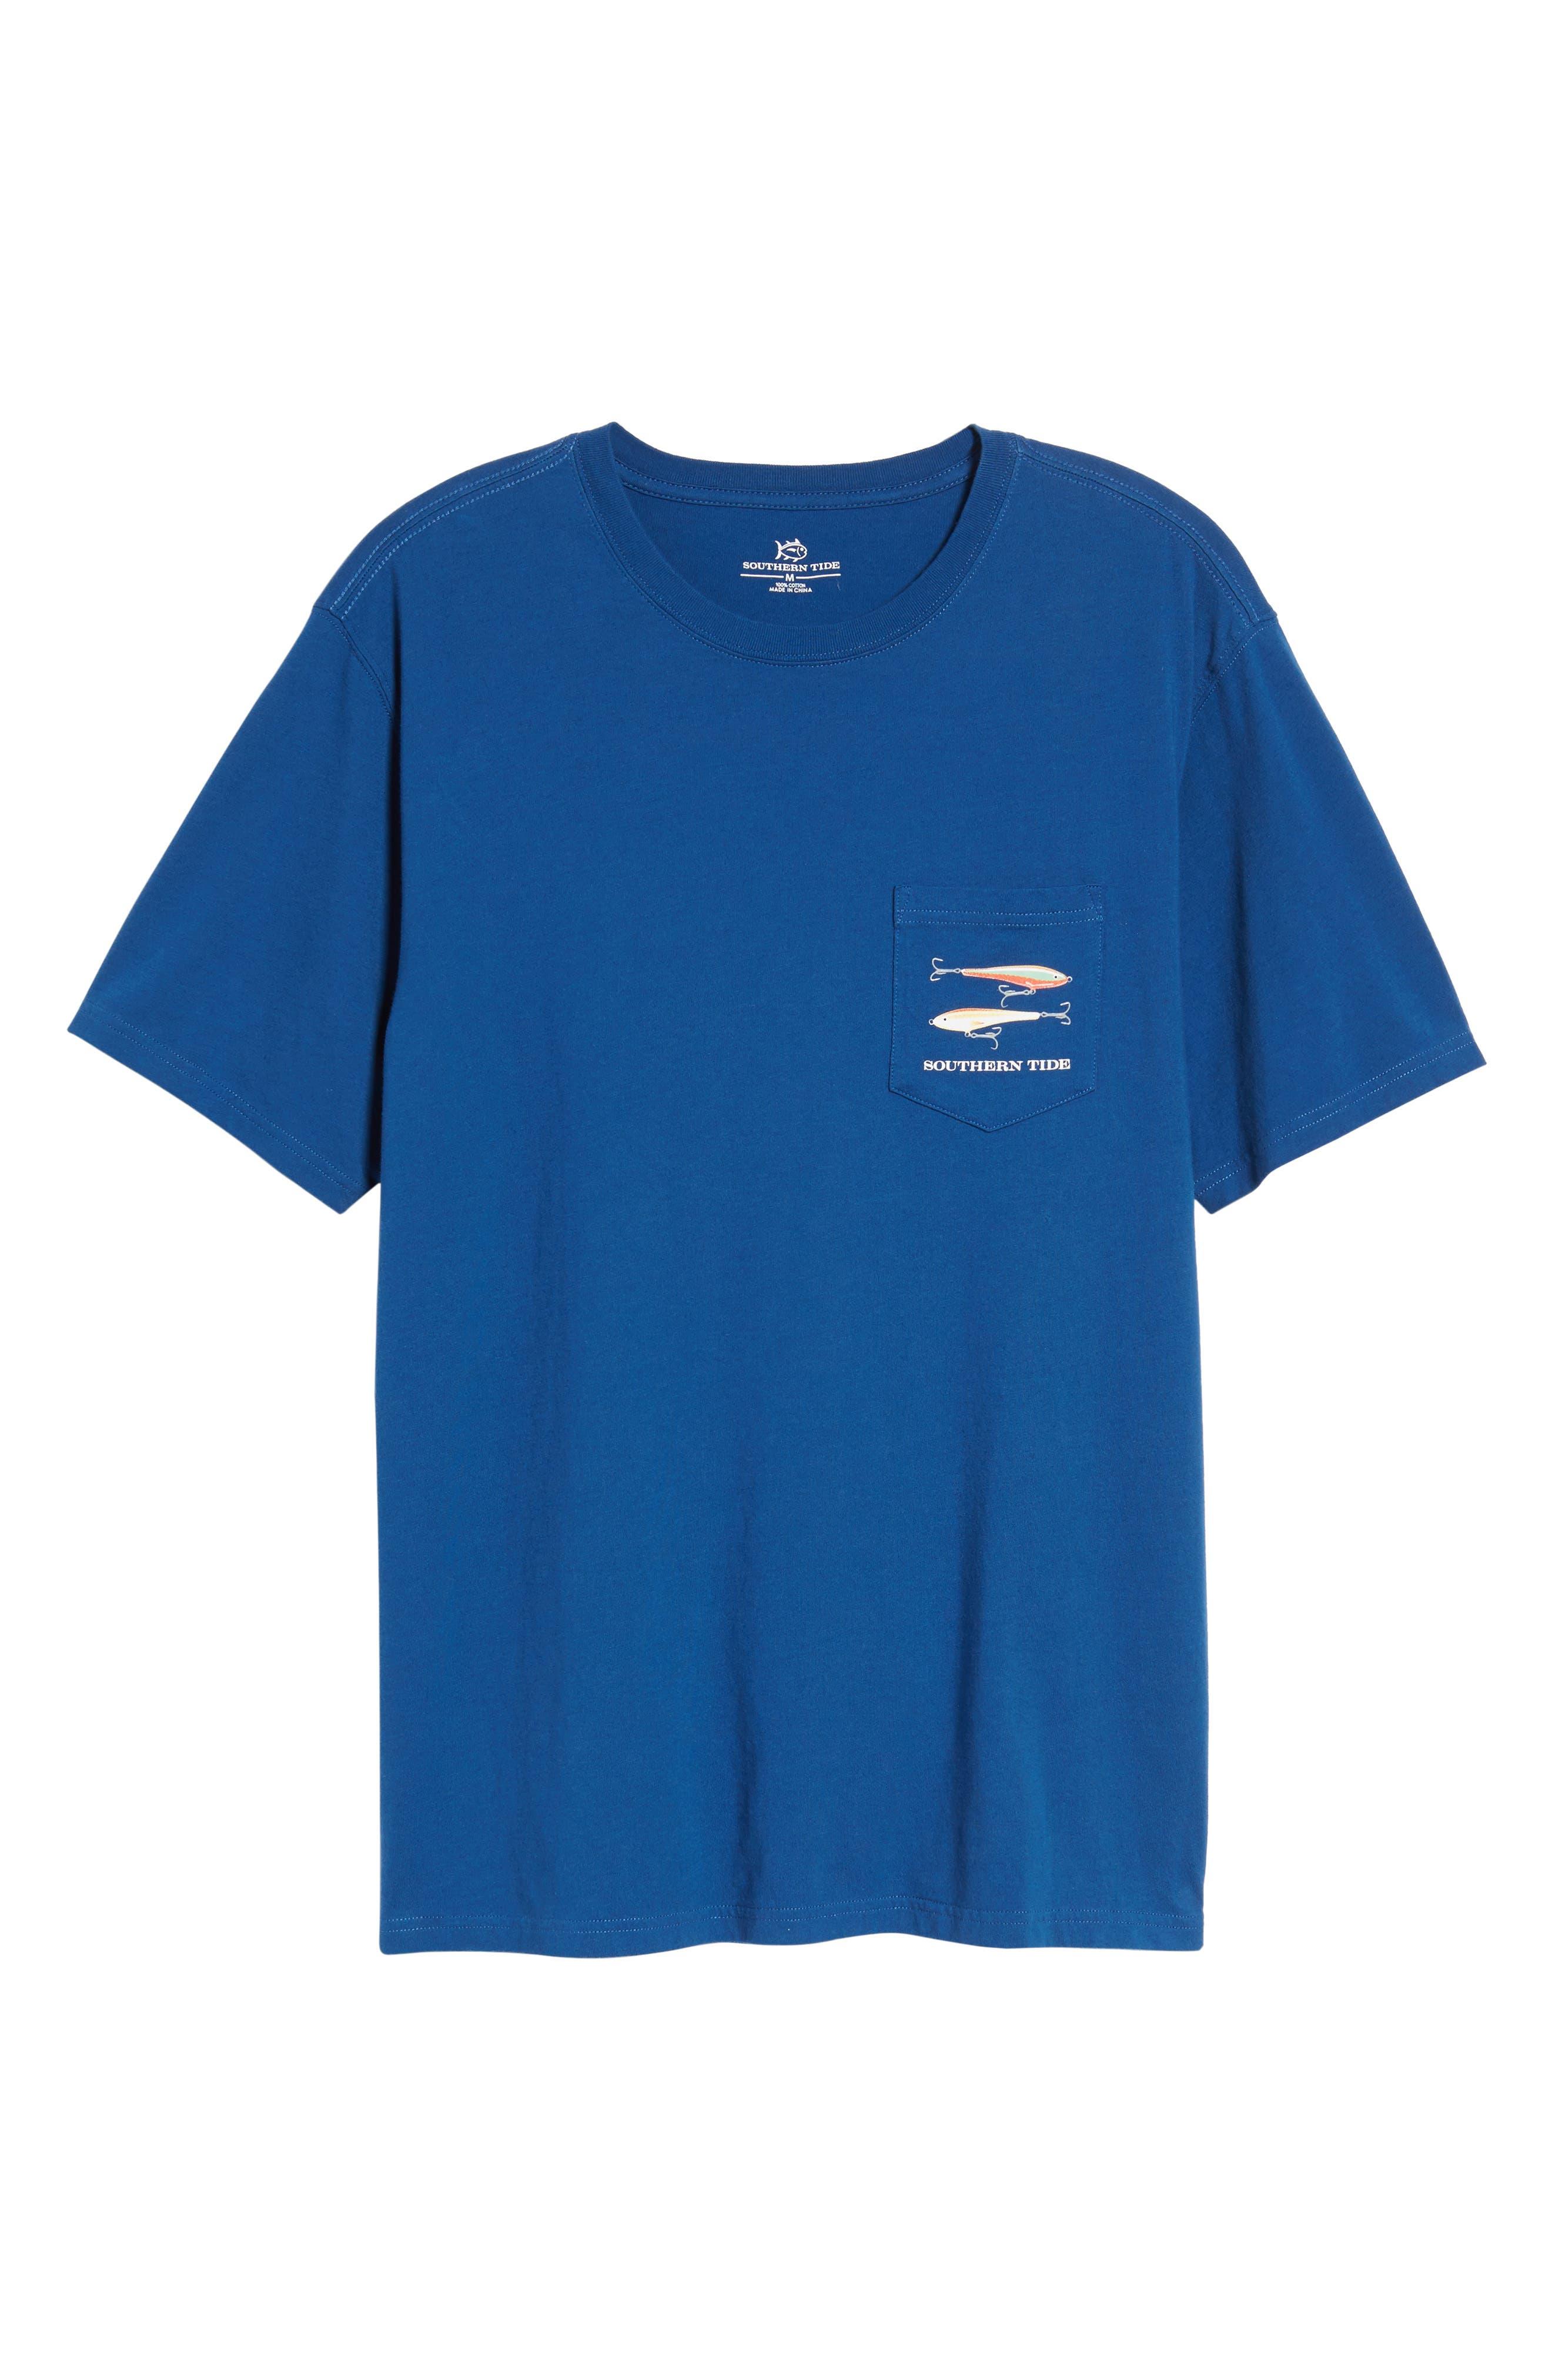 Hanging Out Regular Fit T-Shirt,                             Alternate thumbnail 6, color,                             Blue Lake